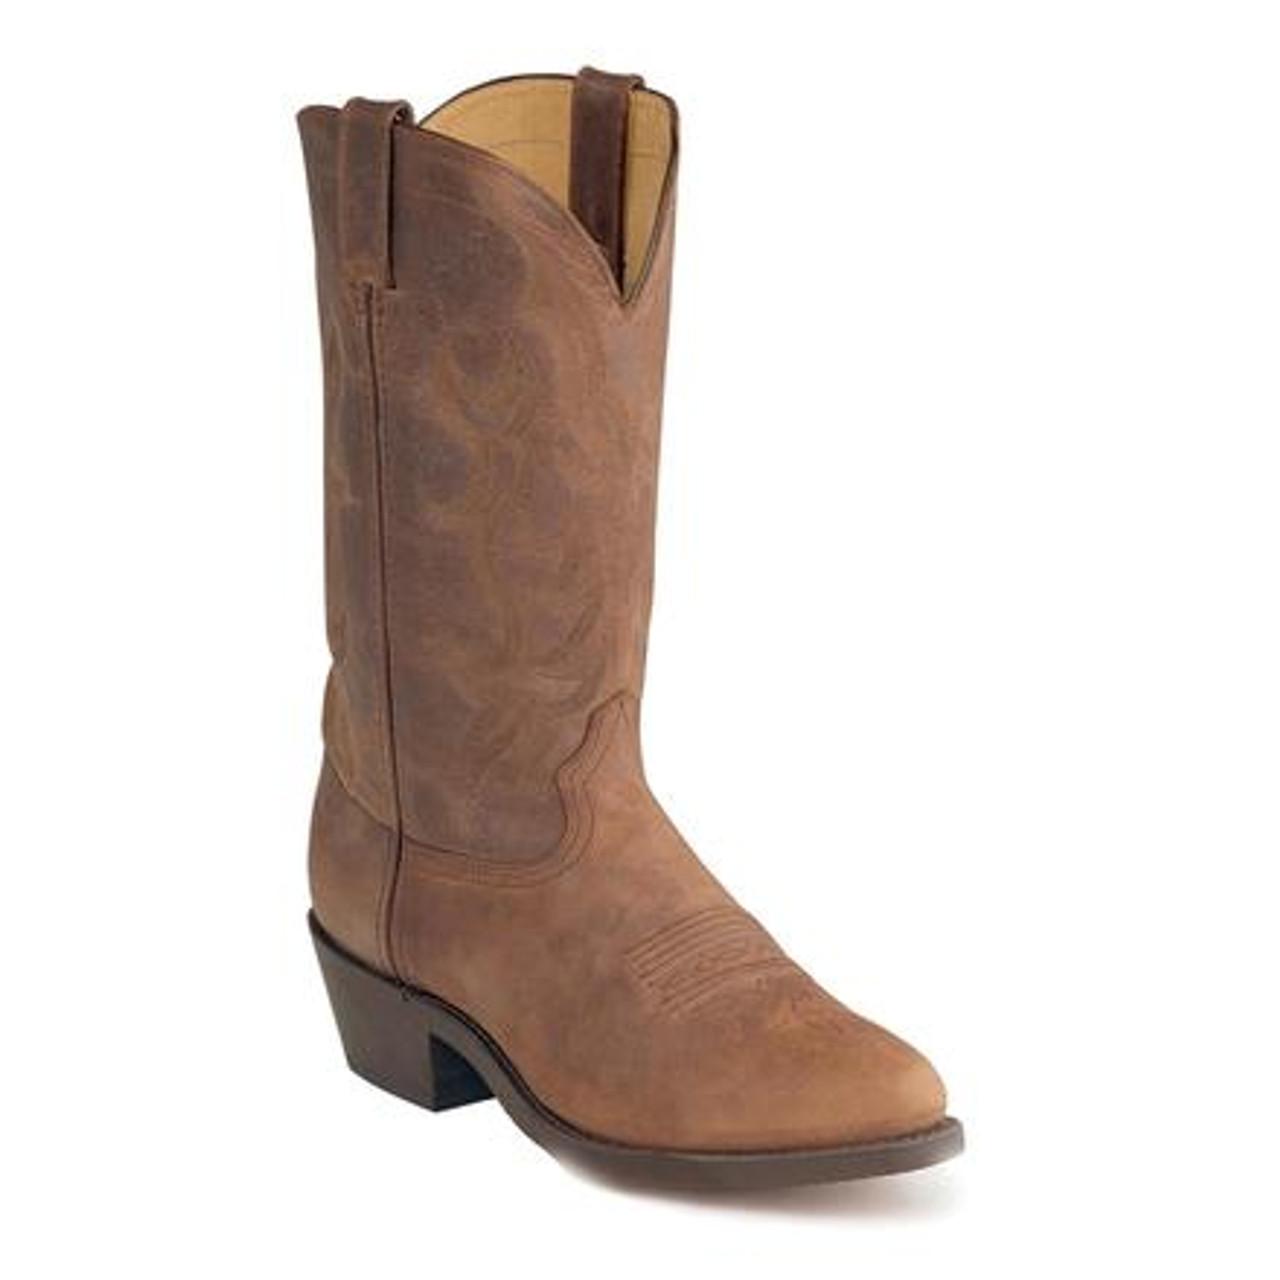 Men's Durango Brown Medium Round Toe Western Boot - Herbert's Boots and Western  Wear